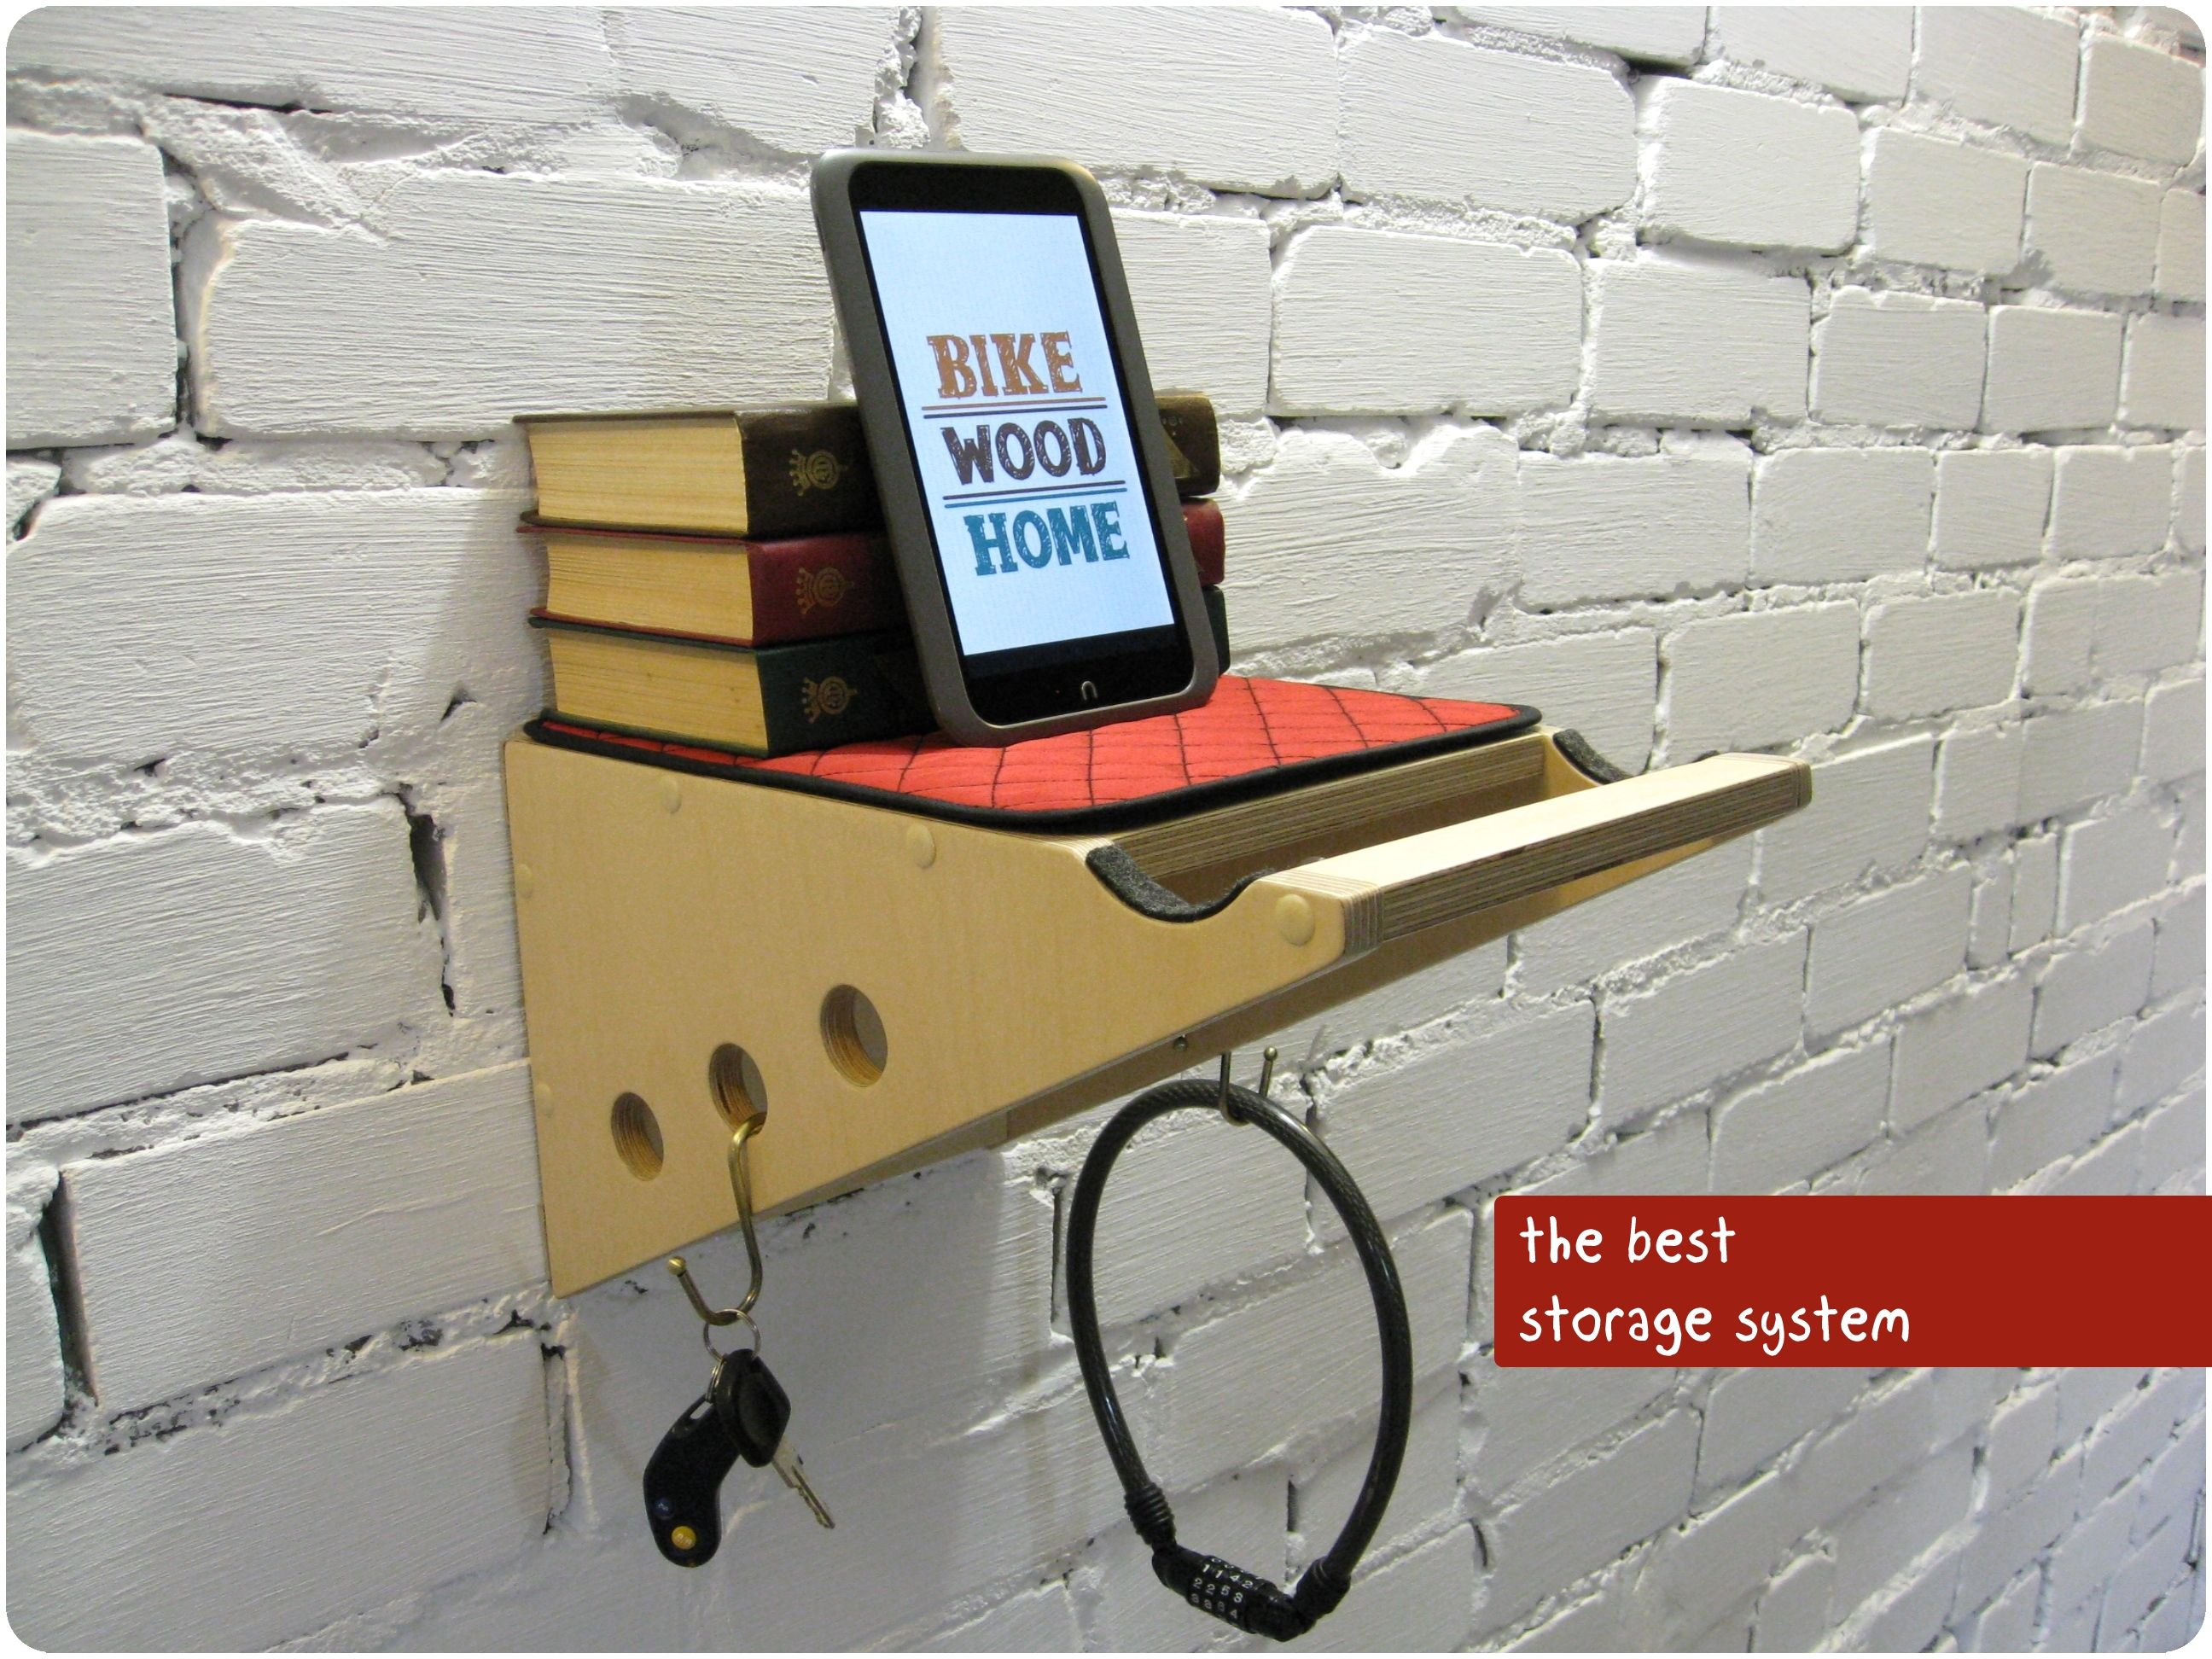 pin by mark mccormack on bike racks fahrrad fahrrad aufh ngen regal. Black Bedroom Furniture Sets. Home Design Ideas